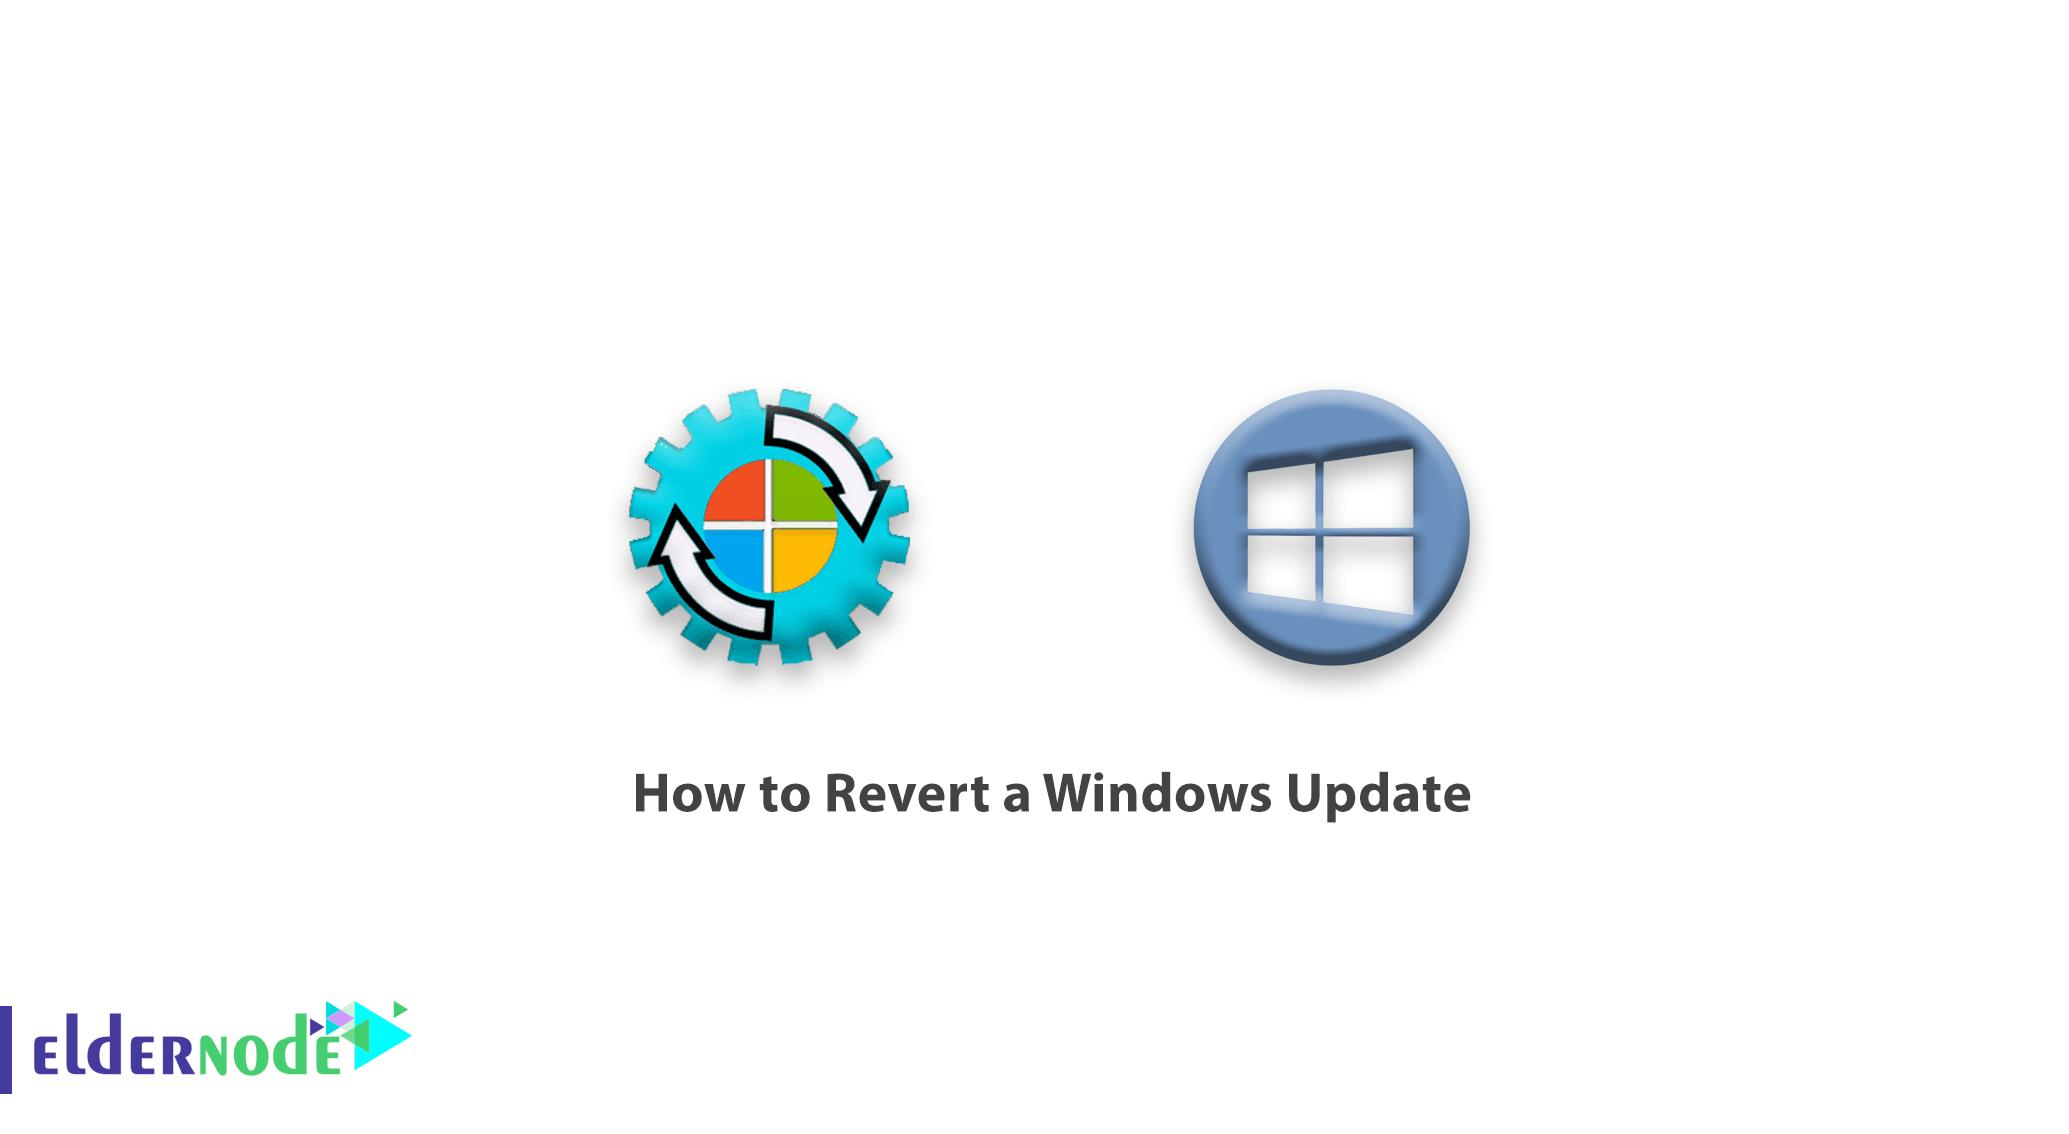 How to Revert a Windows Update